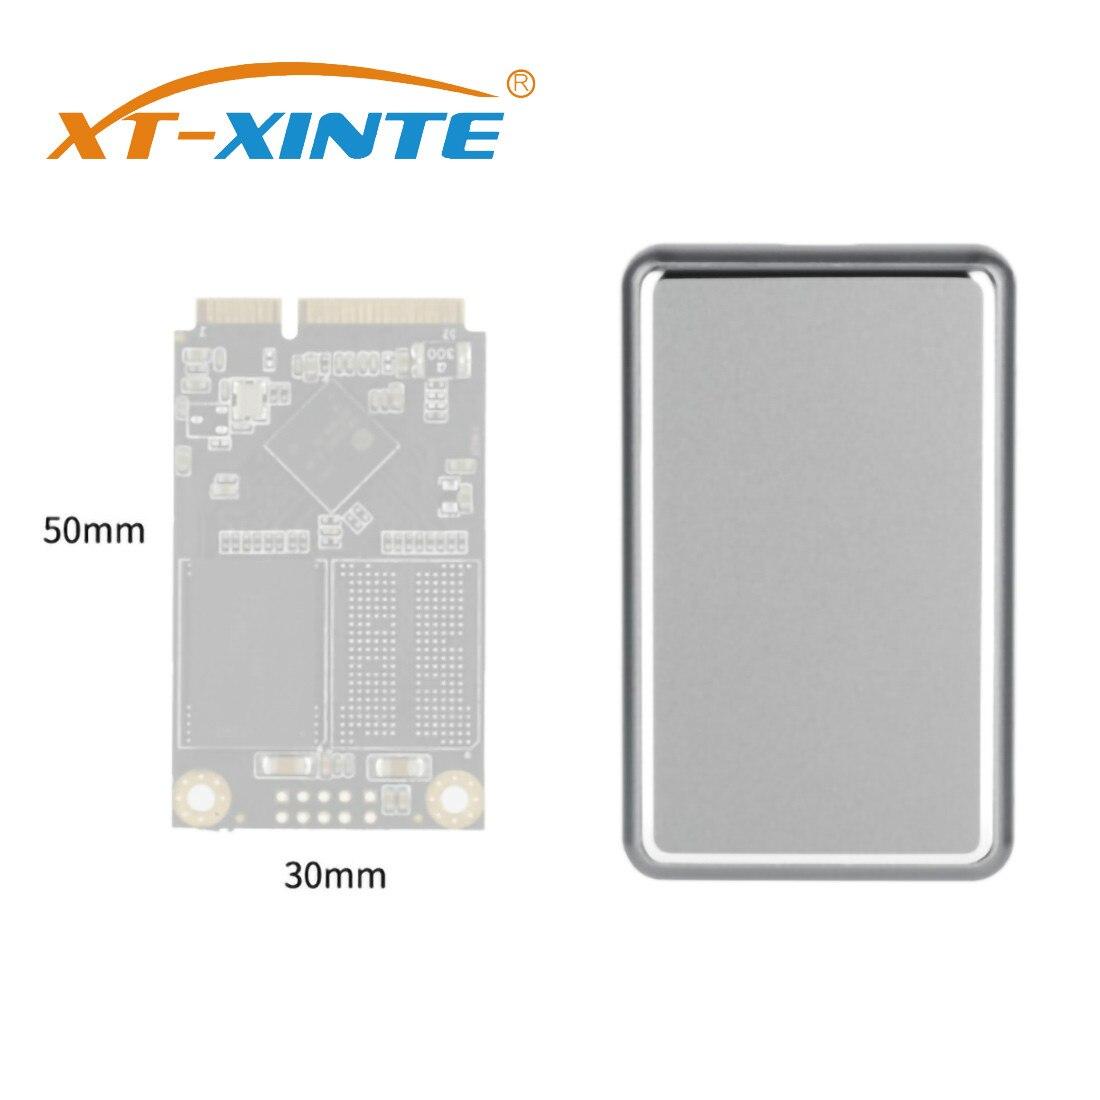 Mini MSATA Type-C SSD Enclosure M.2 M-Key USB3.1 10 Gbps High-Speed USB C Hard Drive Disk Case Support 1TB For Windows/Linux/Mac